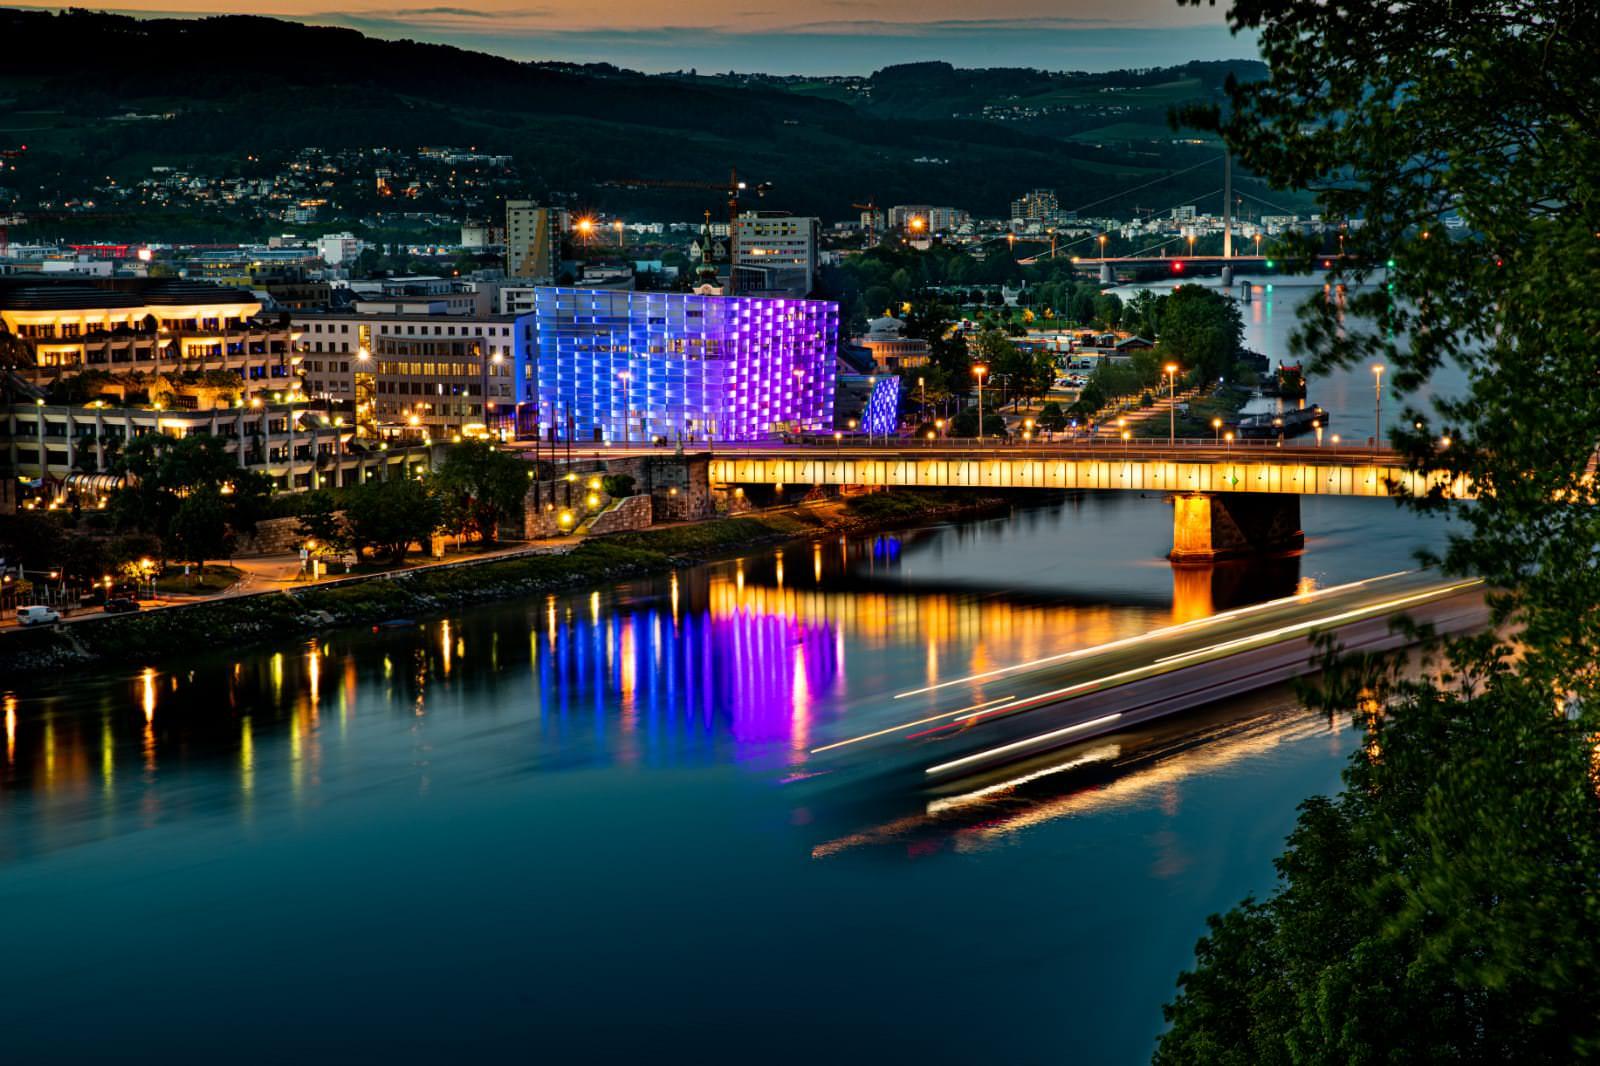 Thomas Truhlar - Linz bei Nacht